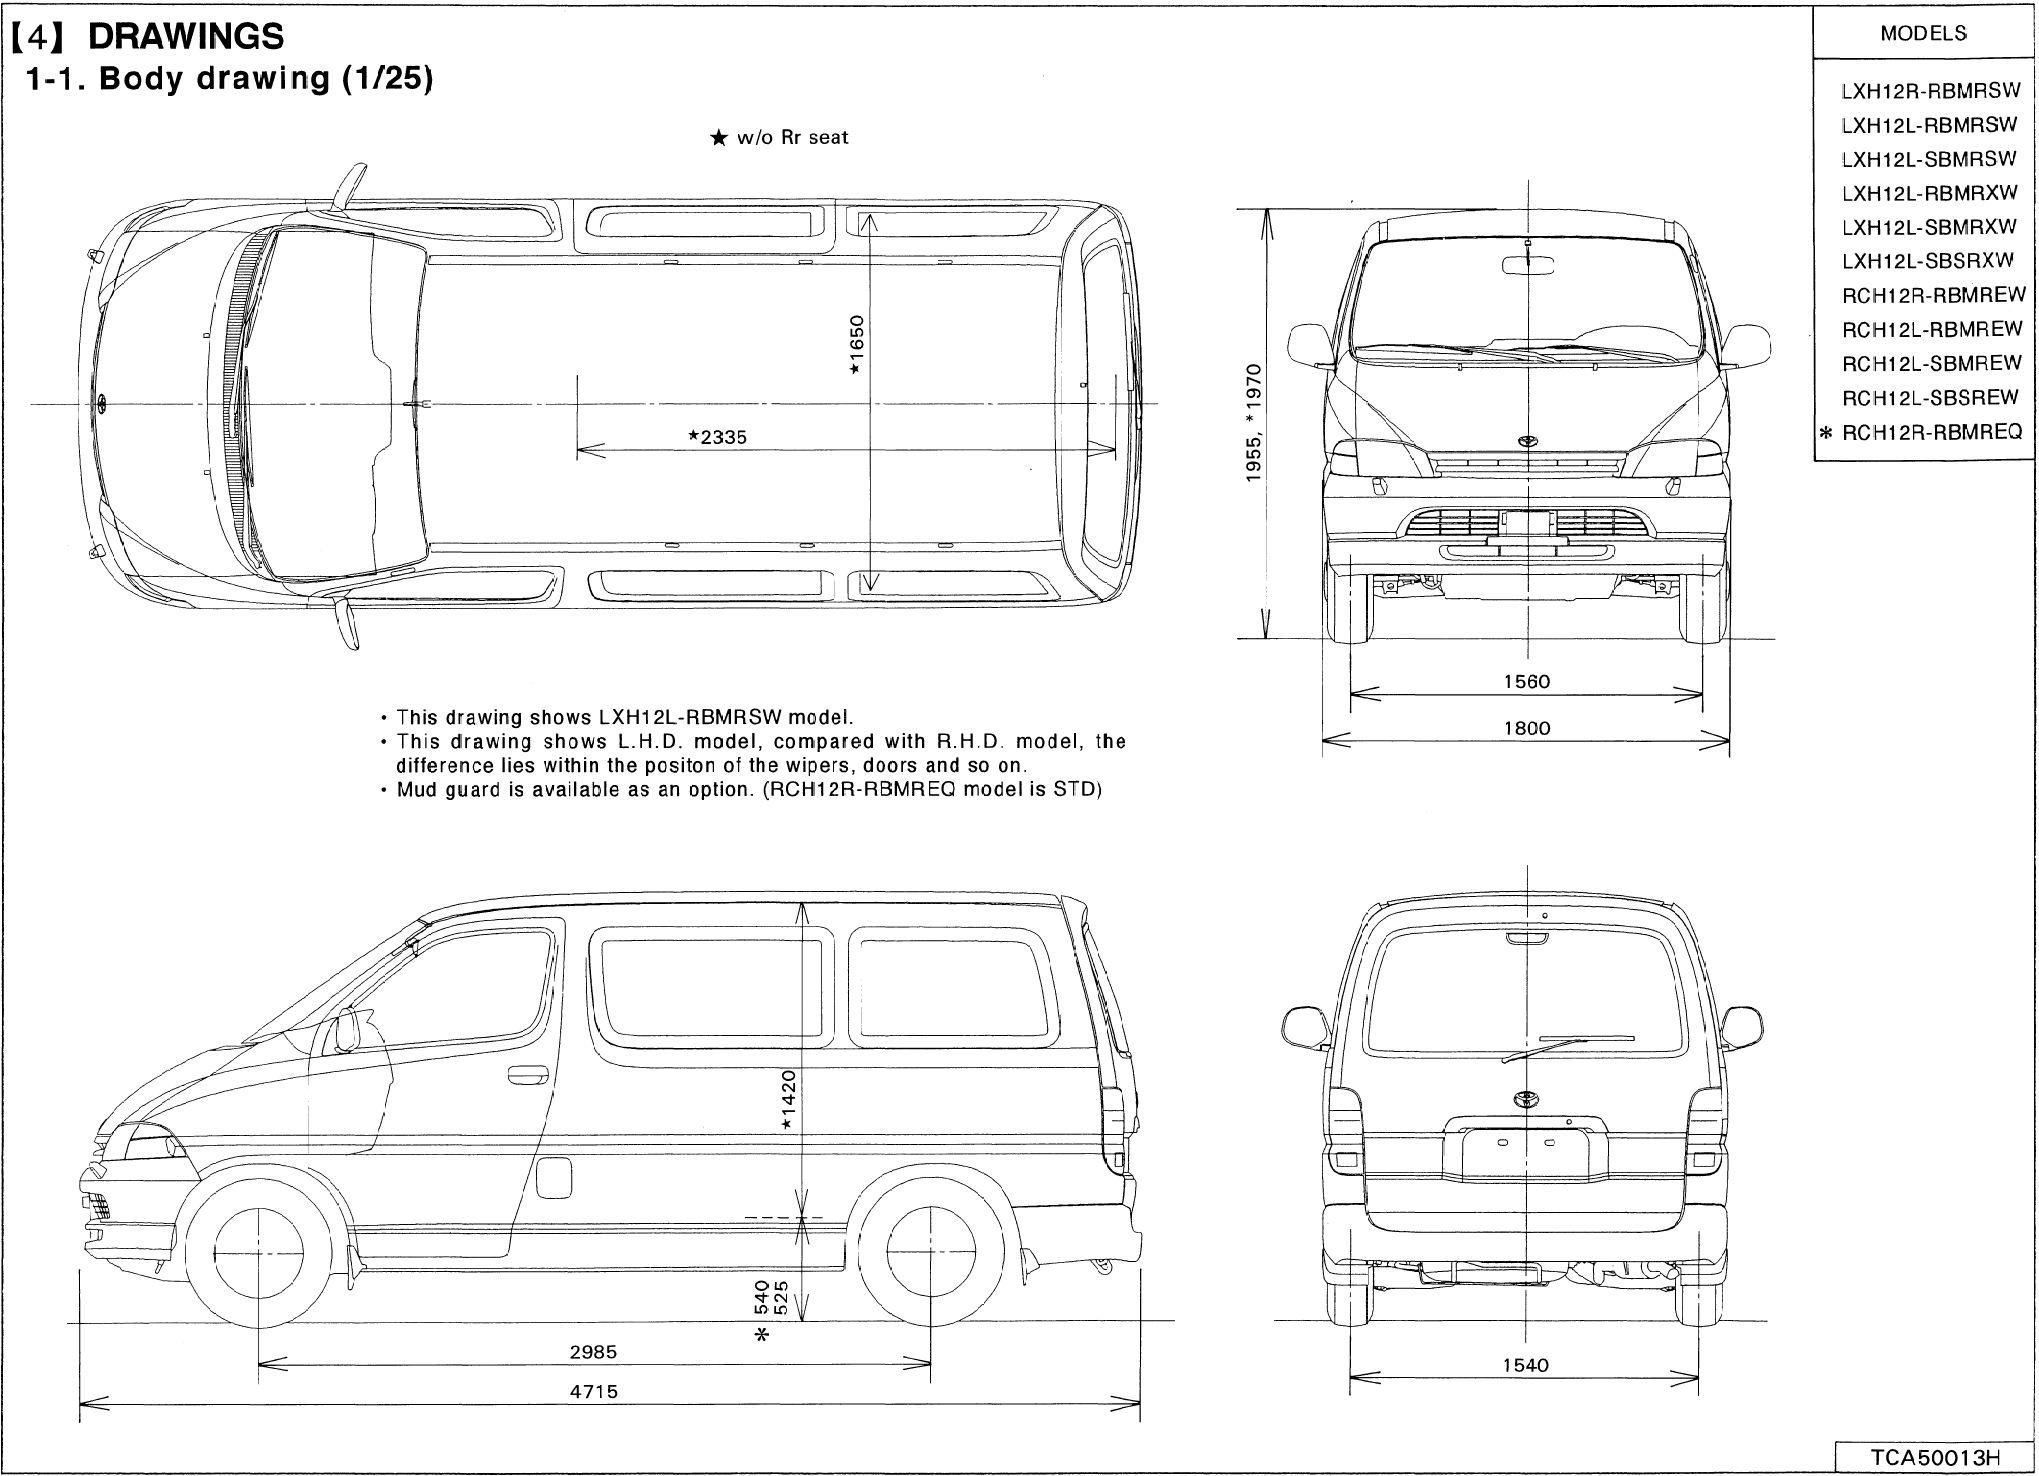 small resolution of toyota hiace blueprint toyota hiace checklist toyota hiace toyota hiace wiring diagram 1998 toyota hiace diagram